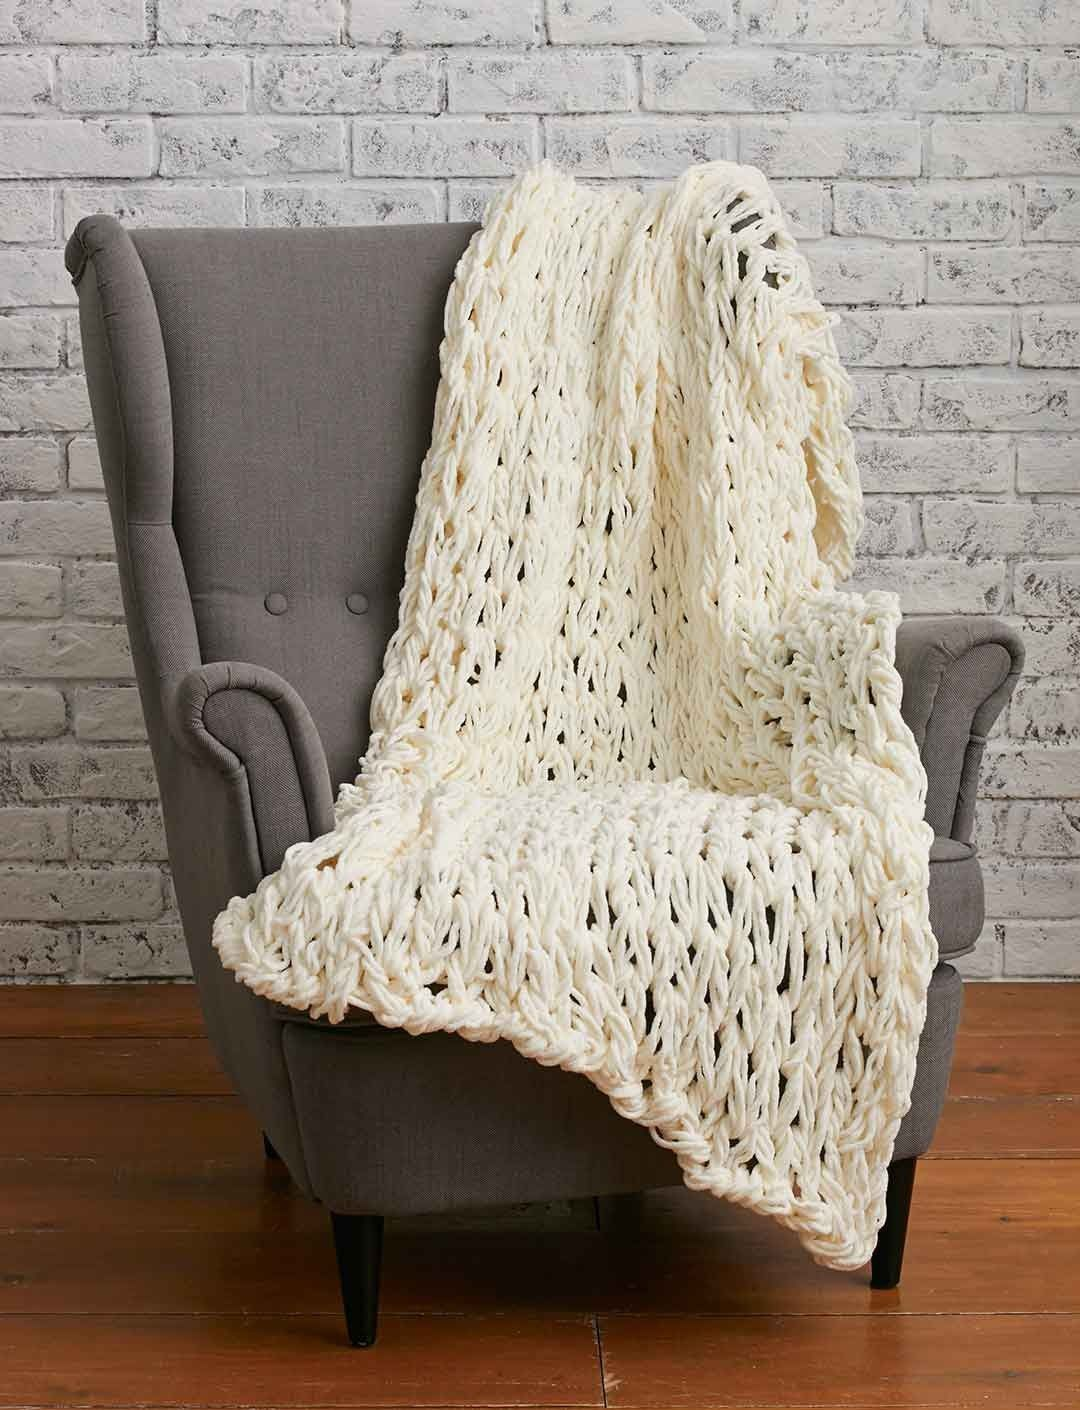 Bernat Arm Knit Super Quick Blanket | Yarnspirations #armknit ...